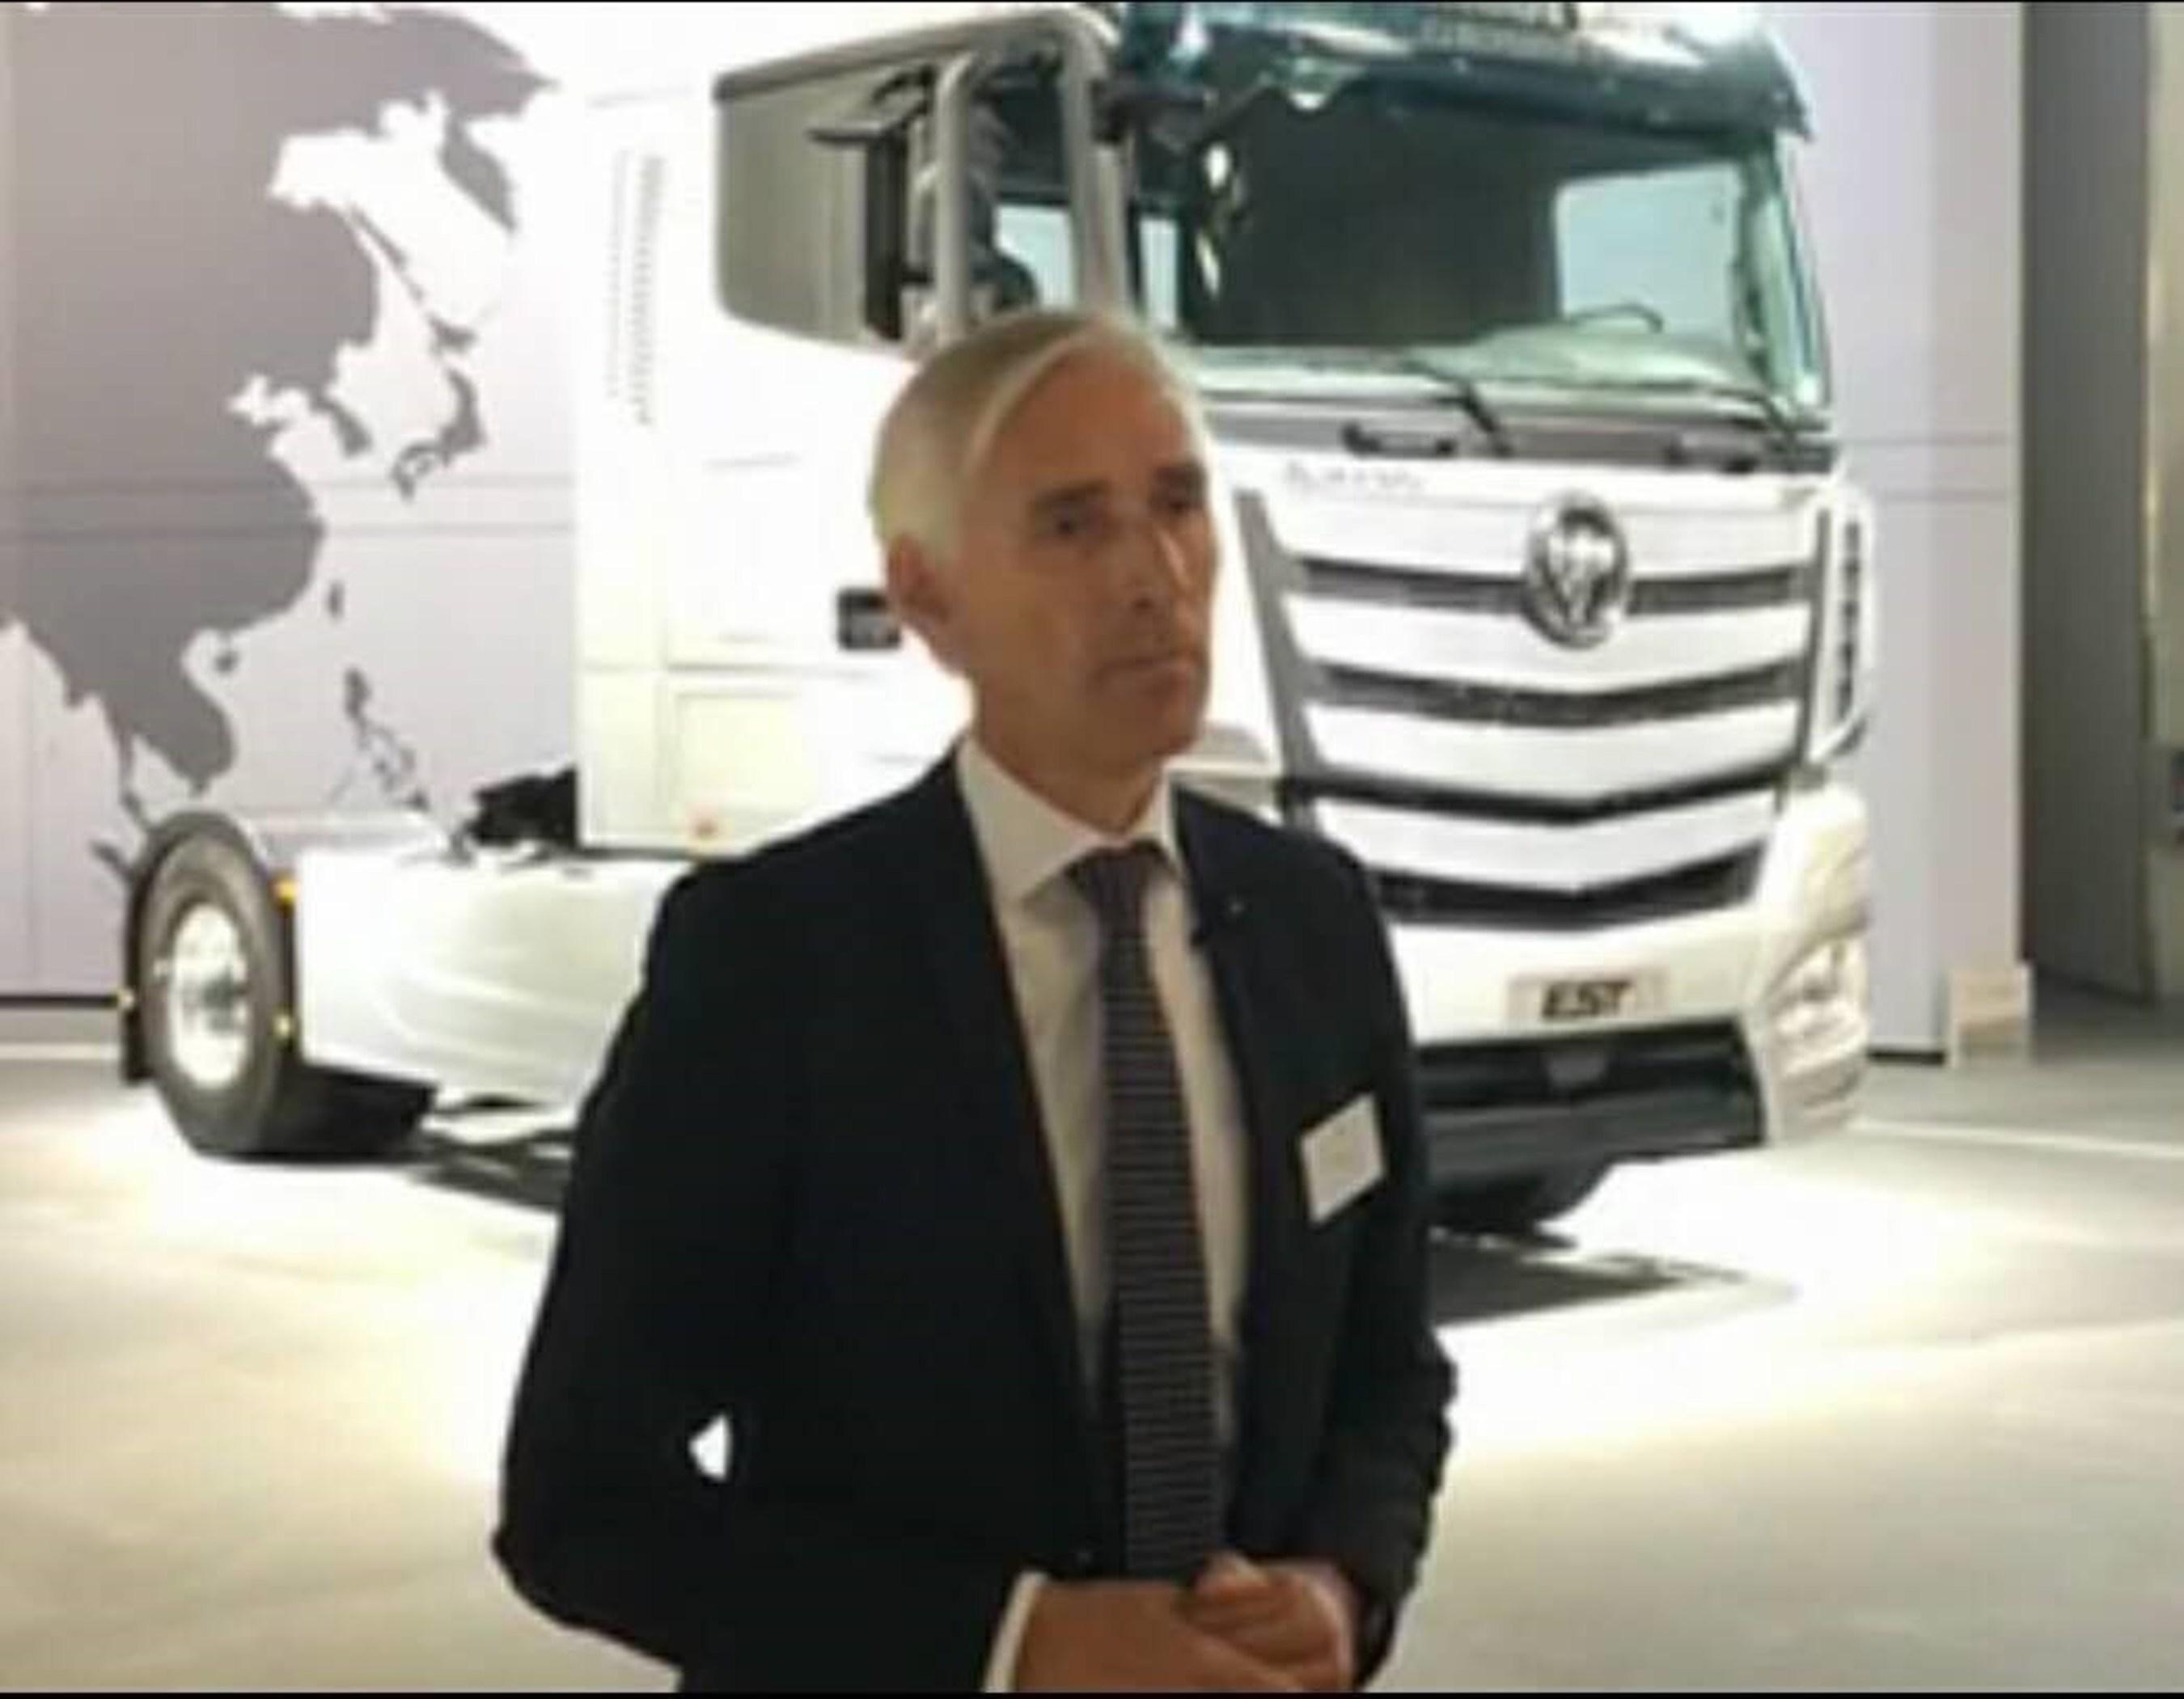 Foton Daimler Automotive Vice President of R&D Jens Hamester Accepting an Interview